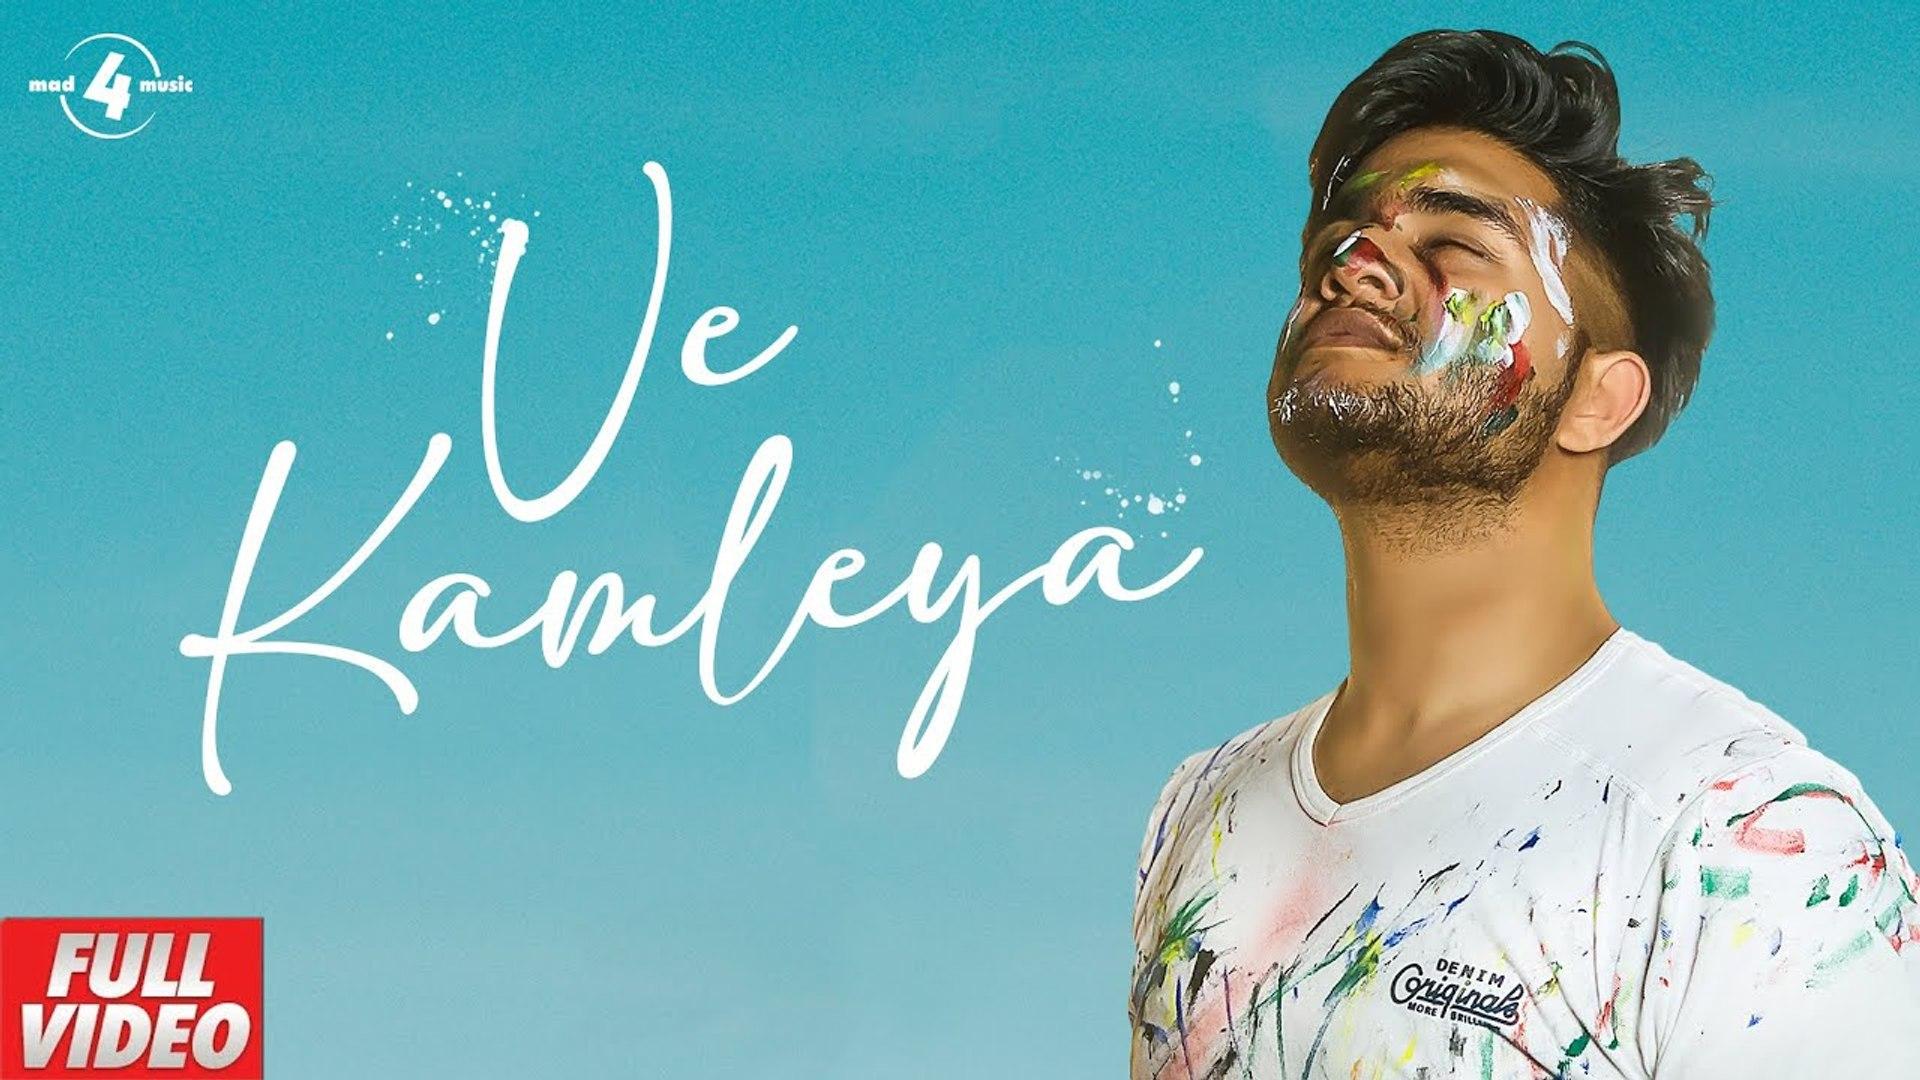 VE KAMLEYA (Lyrical video) | Rox-A | Mad4music | Latest Punjabi Song 2020